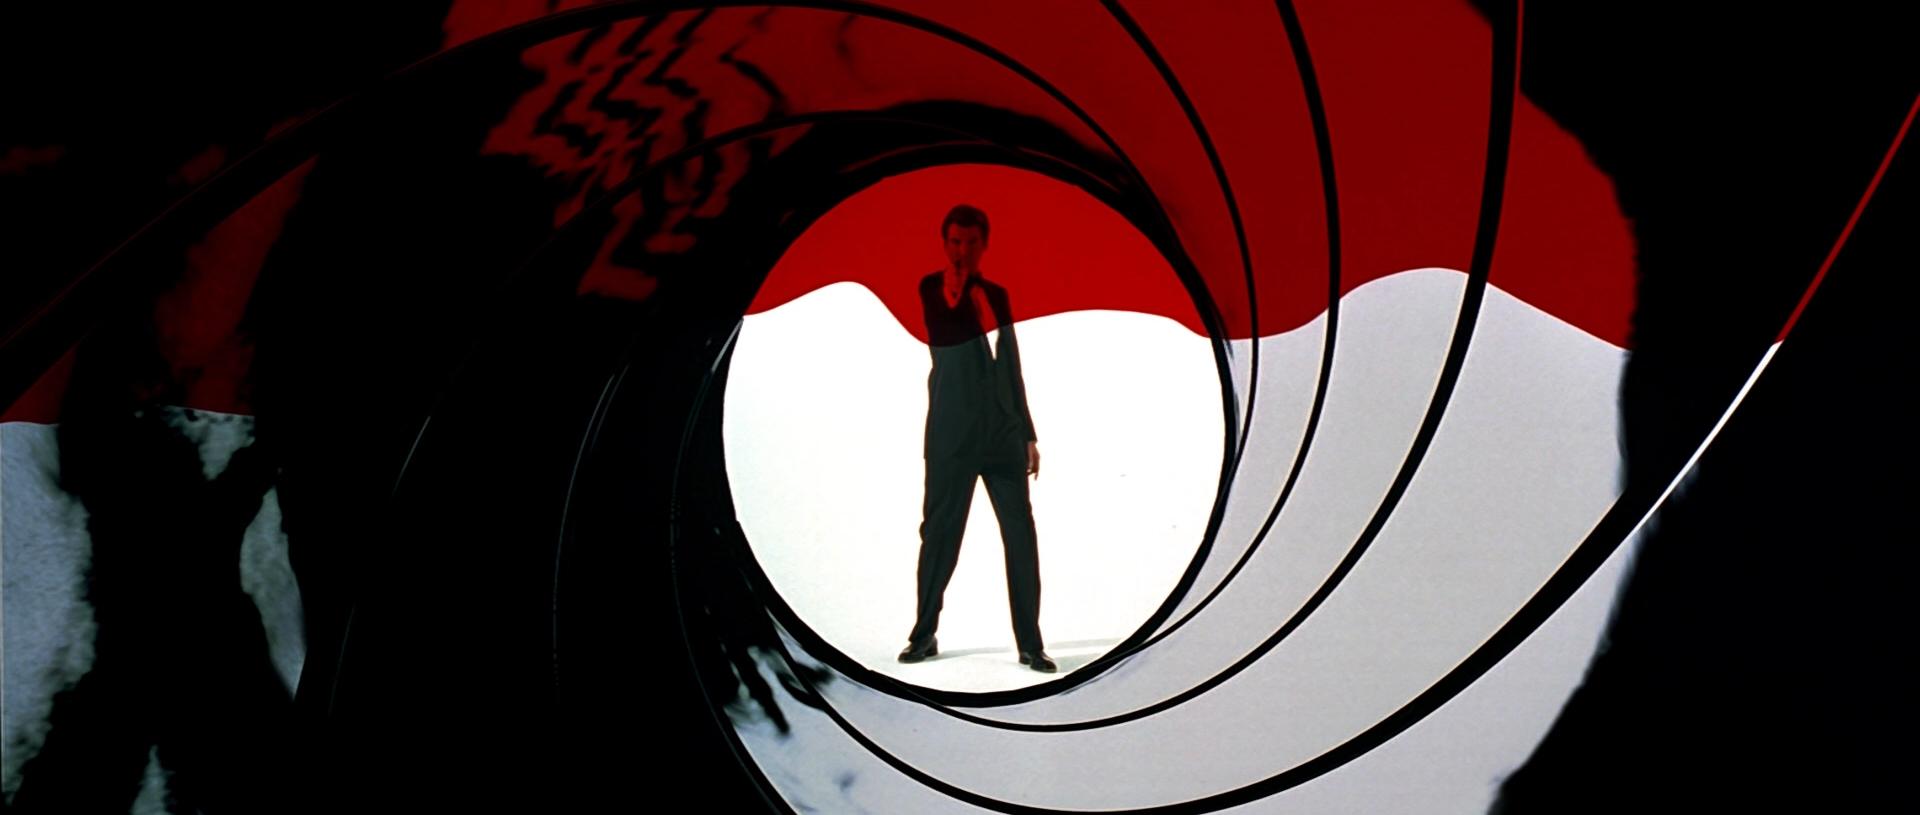 Rank of James Bond Opening Songs – Friendly Neighborhood